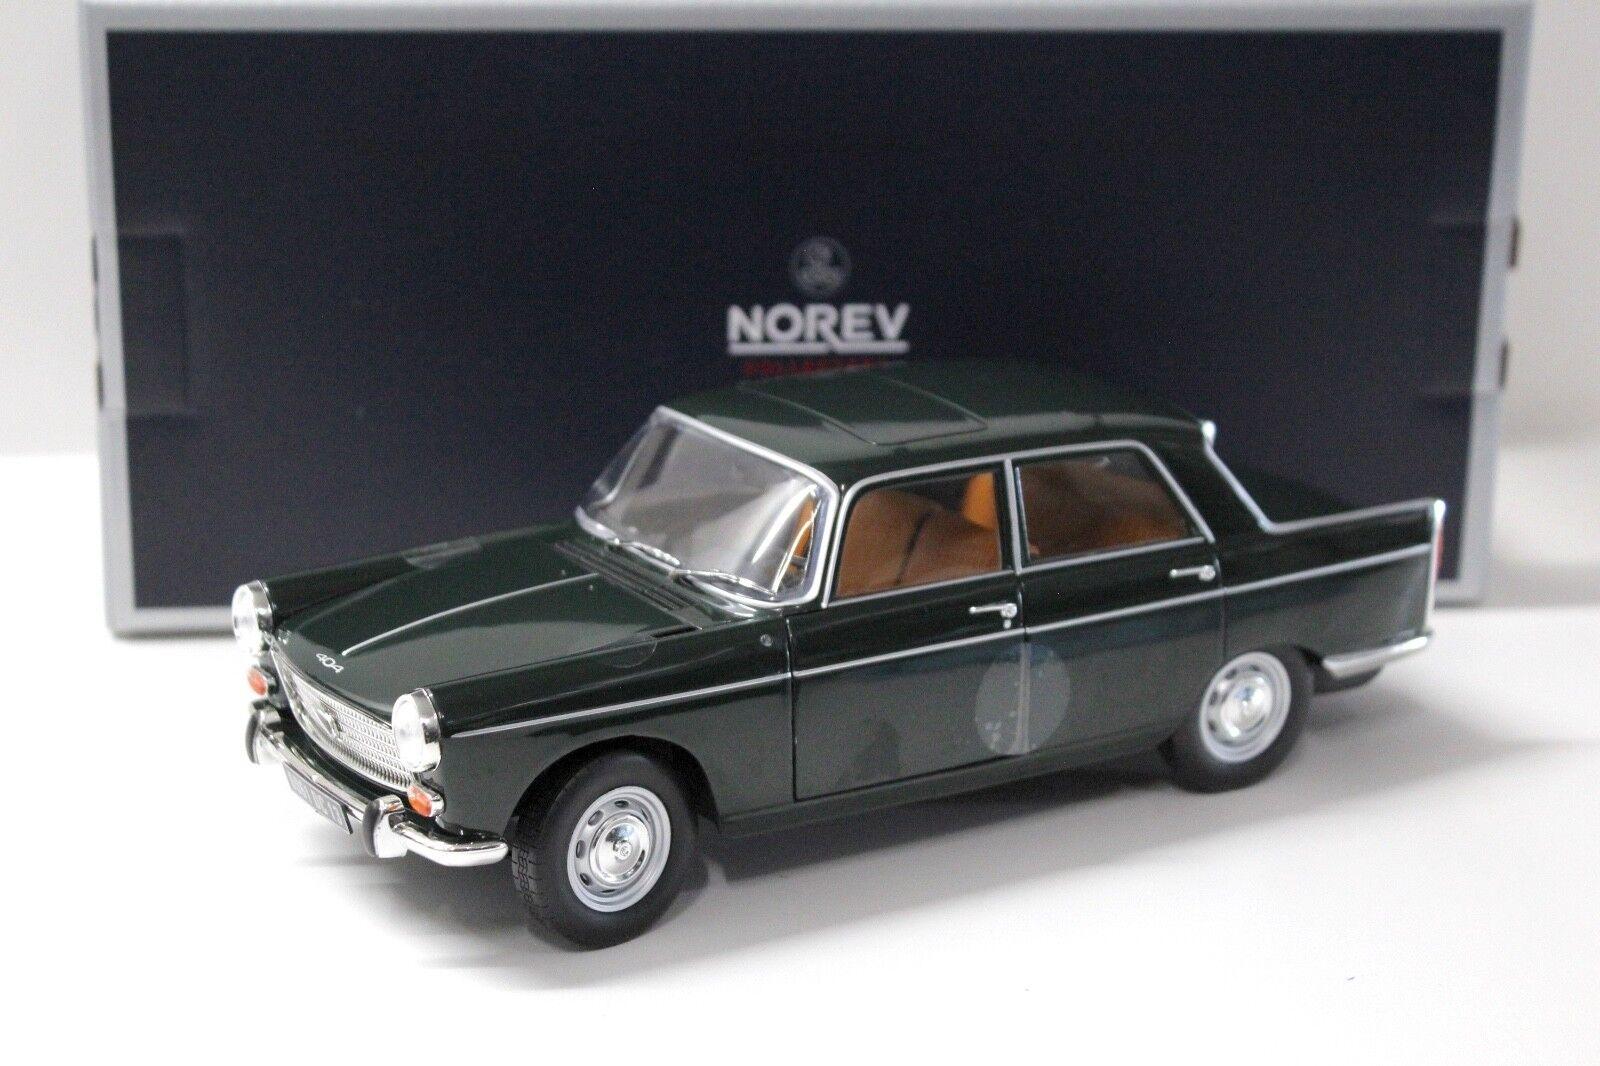 1 18 NOREV PEUGEOT 404 Sedan 1965 DARK verde NEW in Premium-MODELCARS